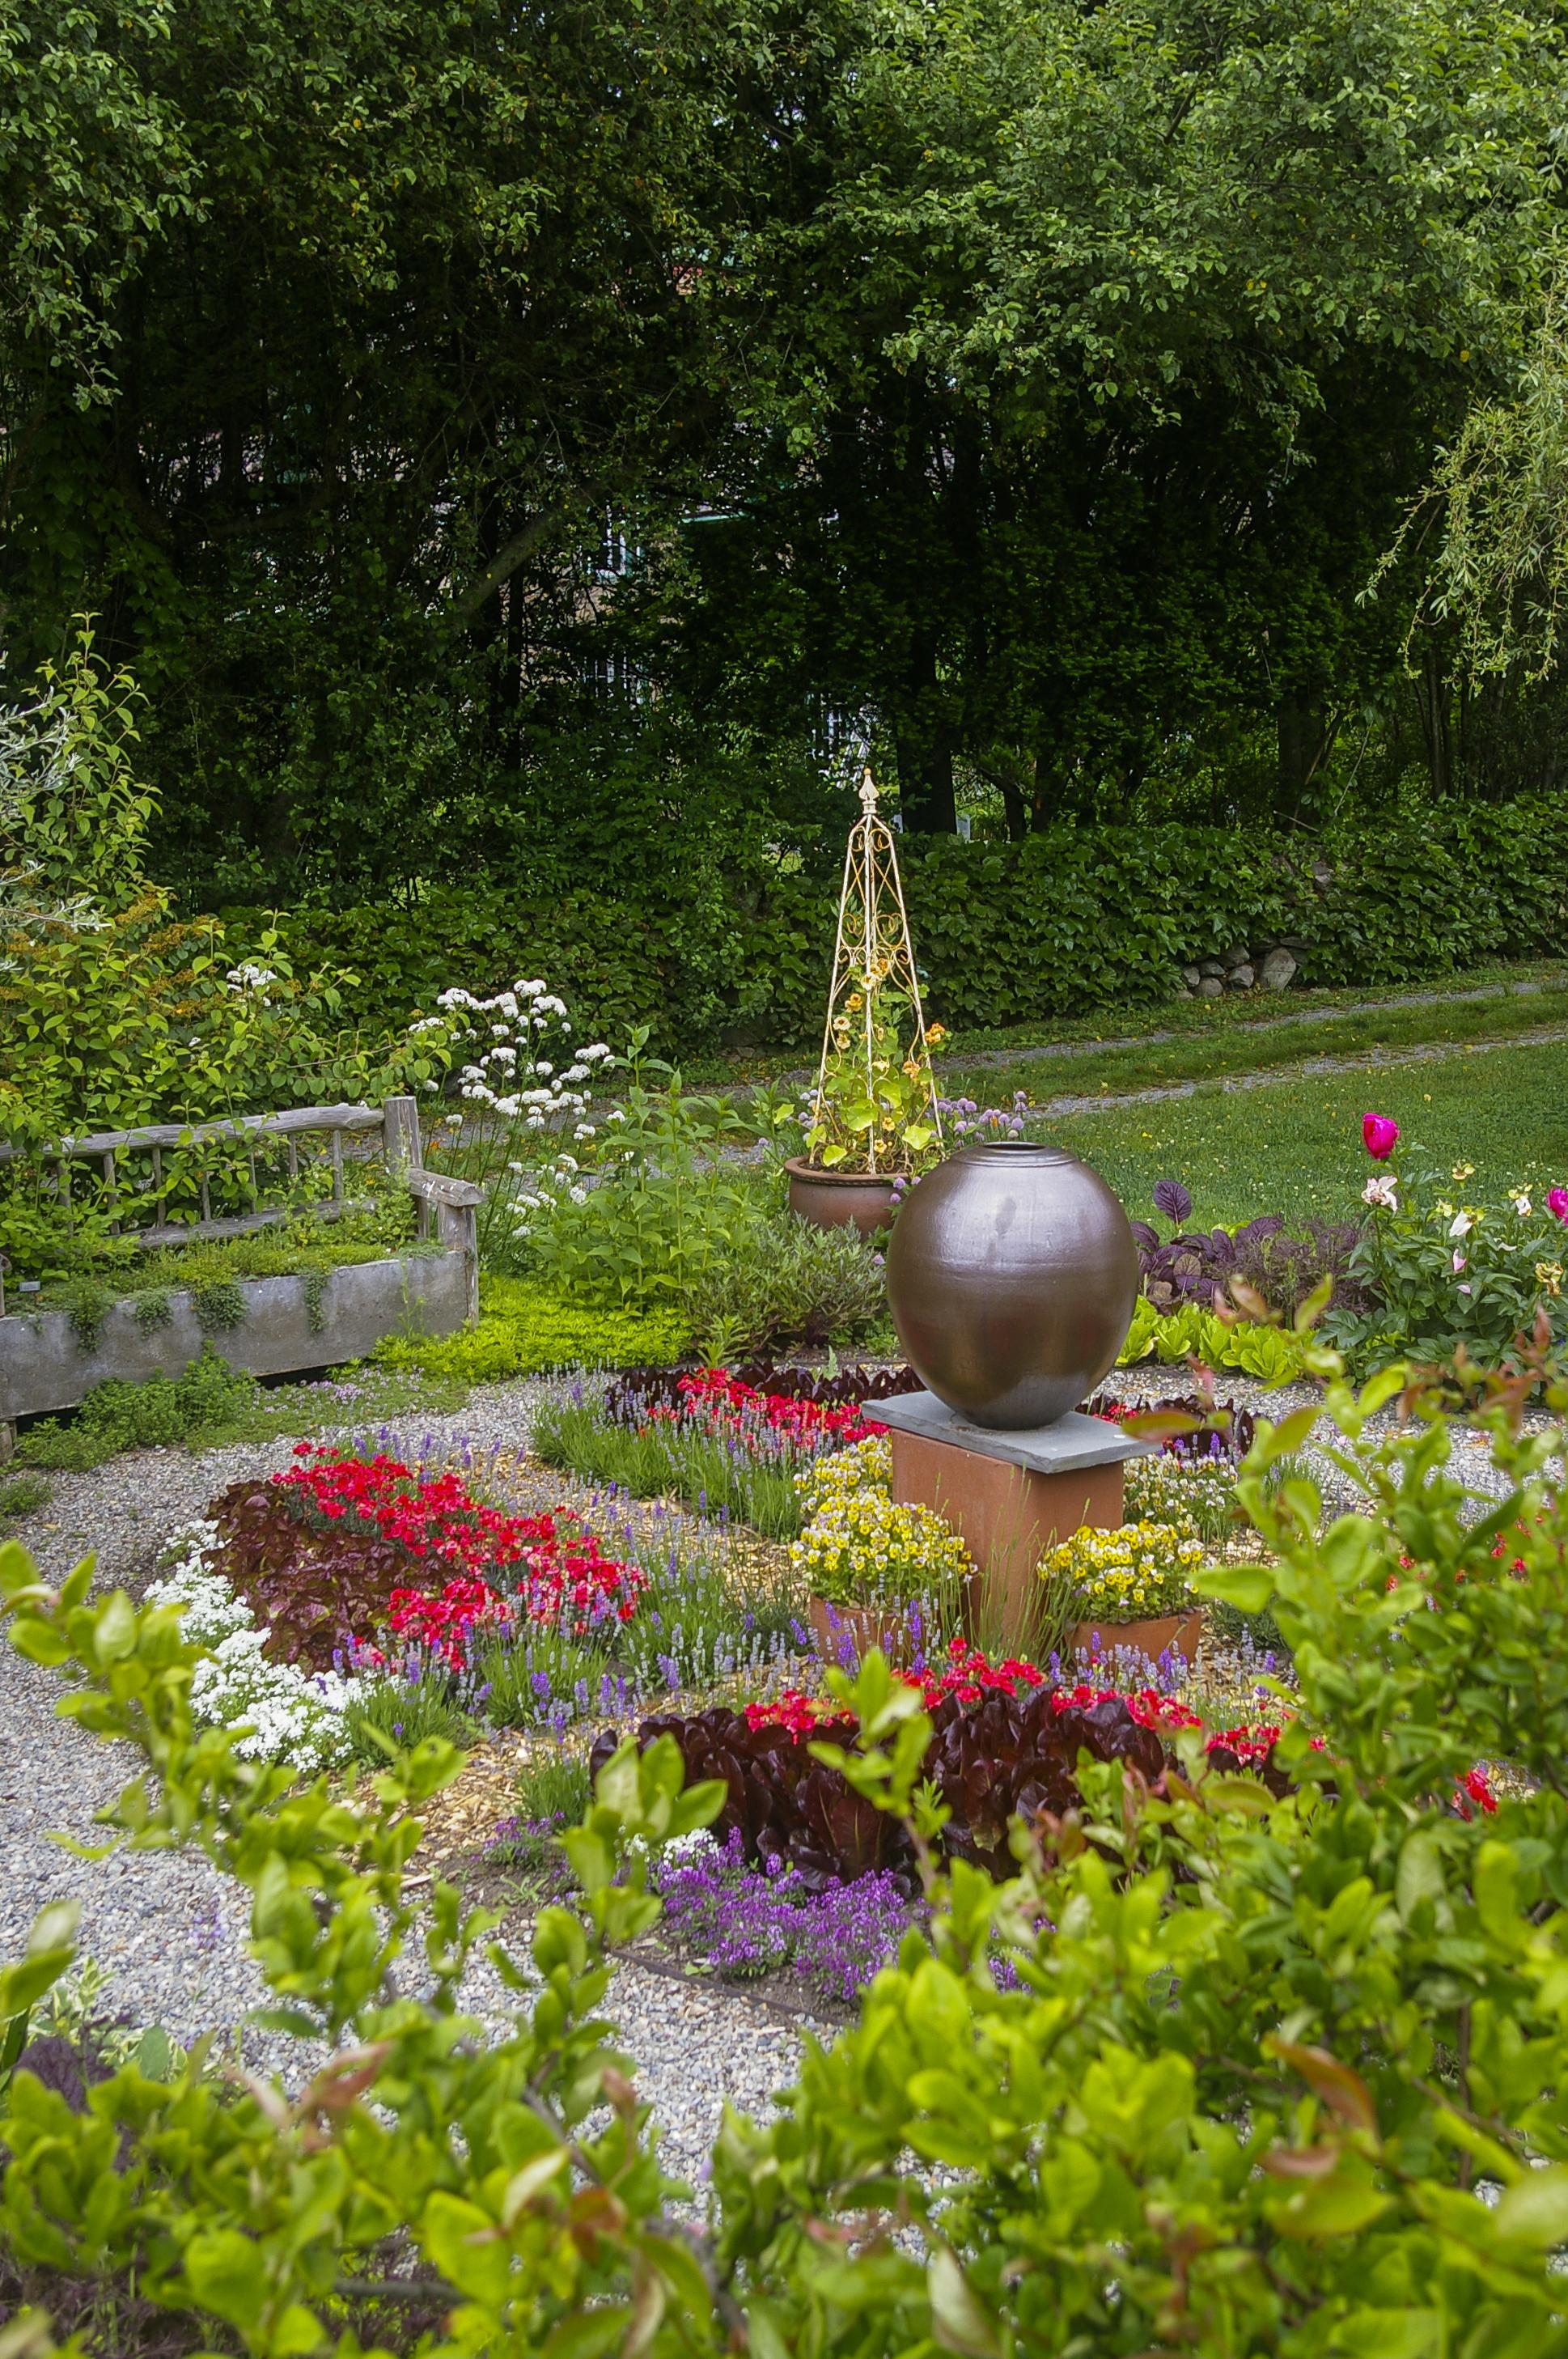 Glazed globe in flower garden